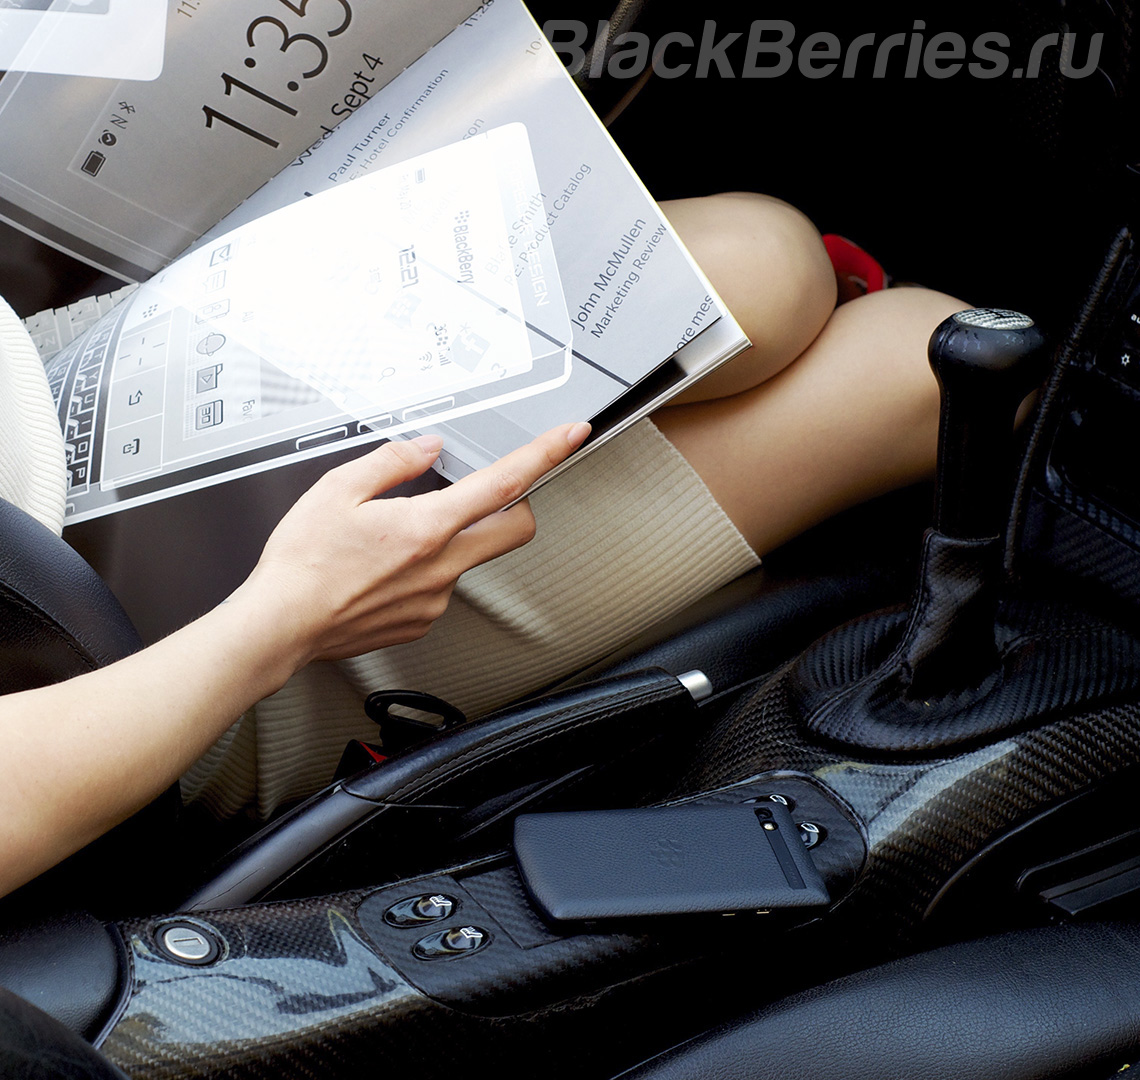 BlackBerry-P9983-PorscheDesign-7